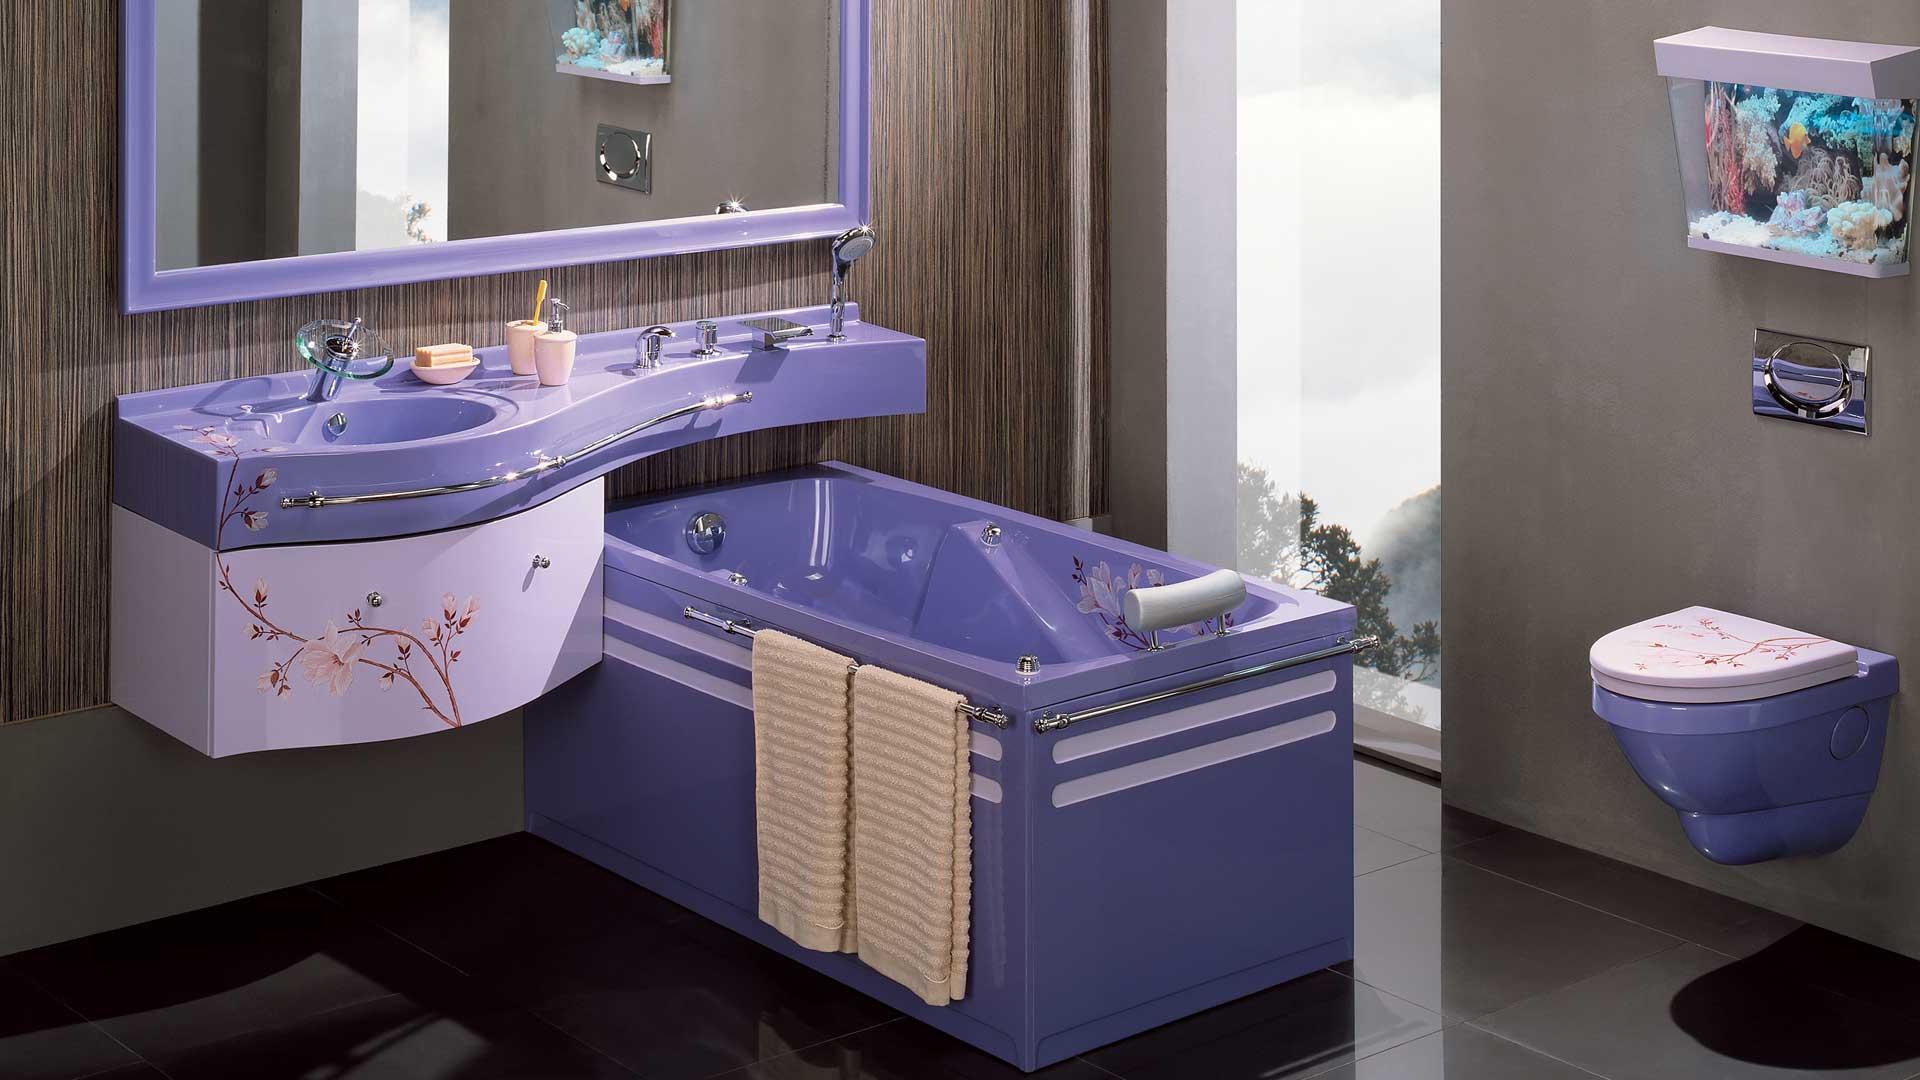 Сантехника фиолетового цвета